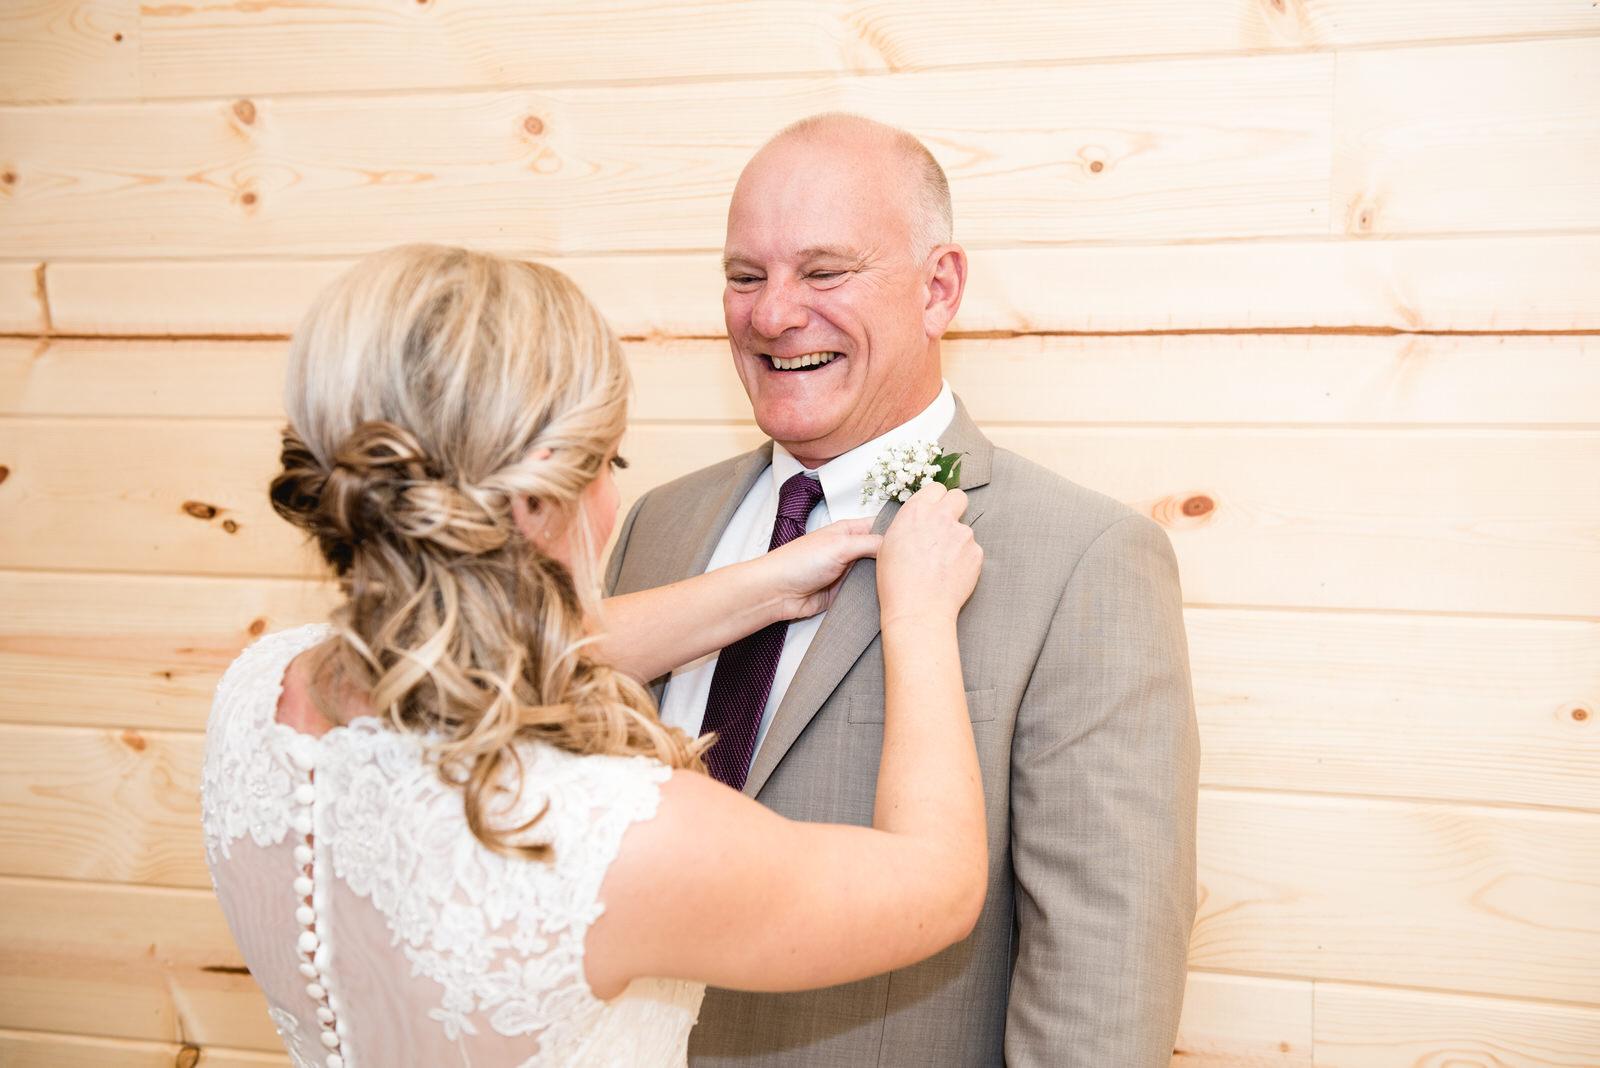 wedding_at_red_fox_winery_wedding_photographer011.jpg